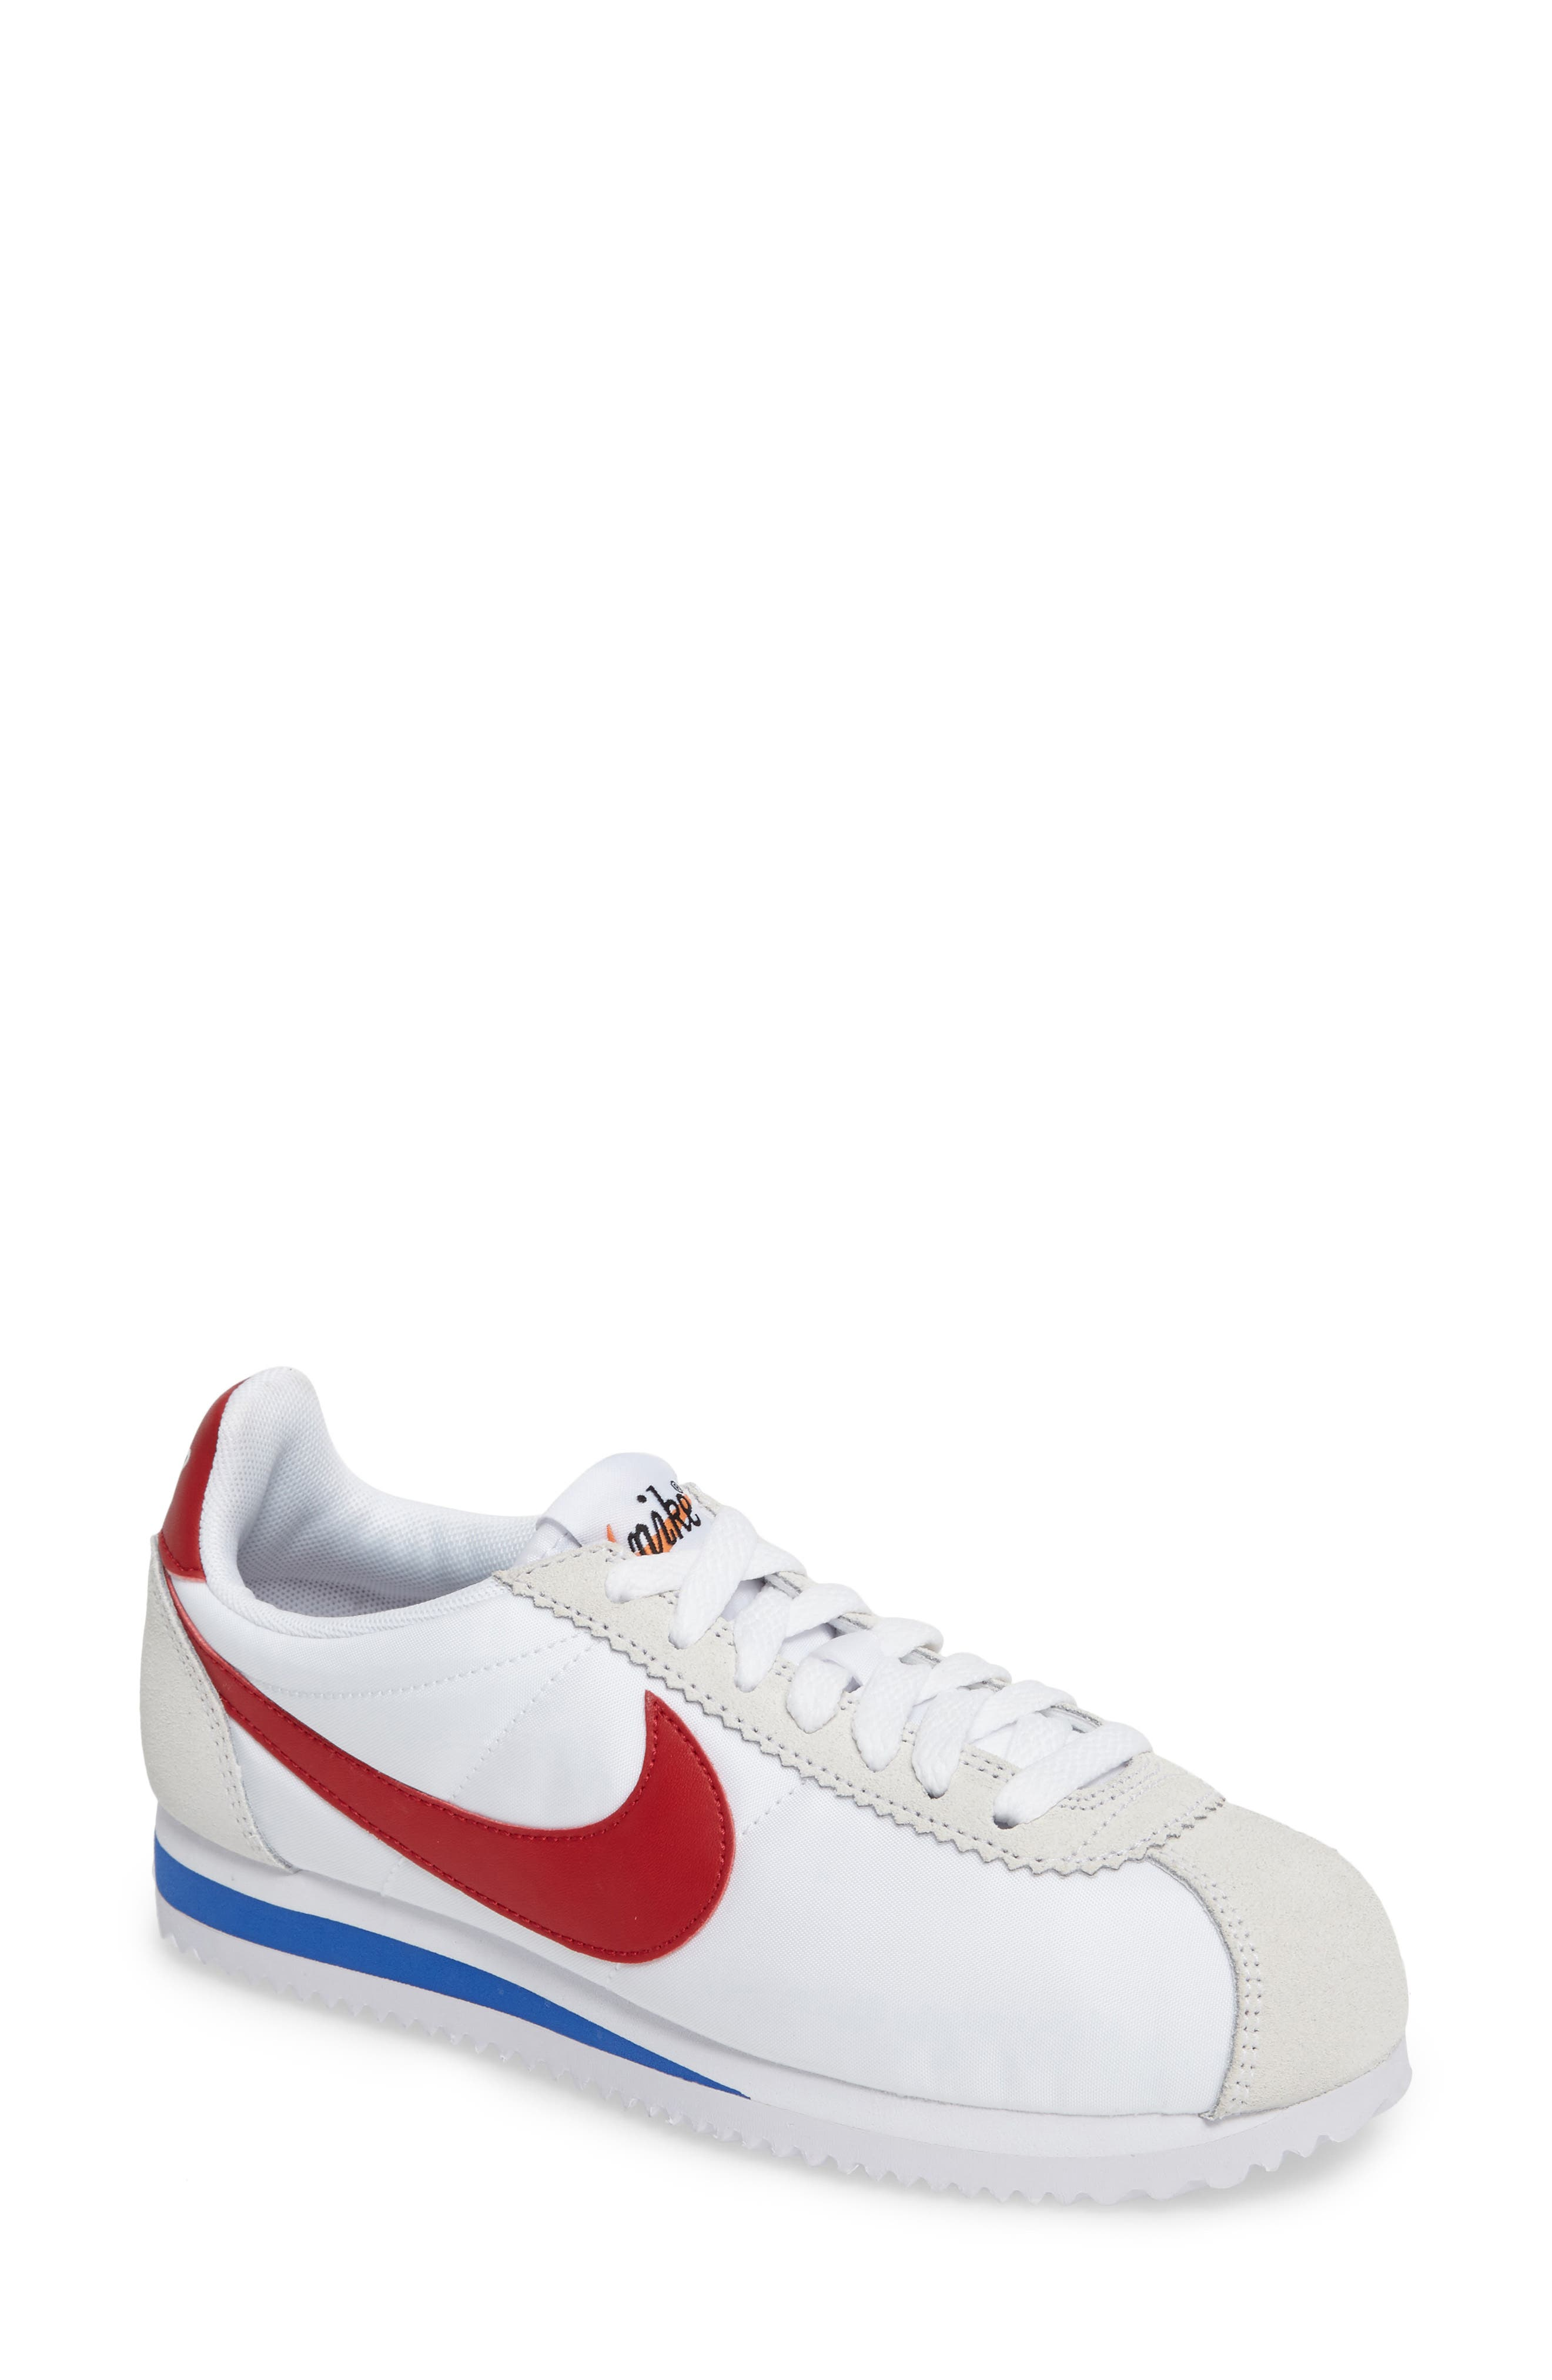 Main Image - Nike Classic Cortez Premium Sneaker (Women)